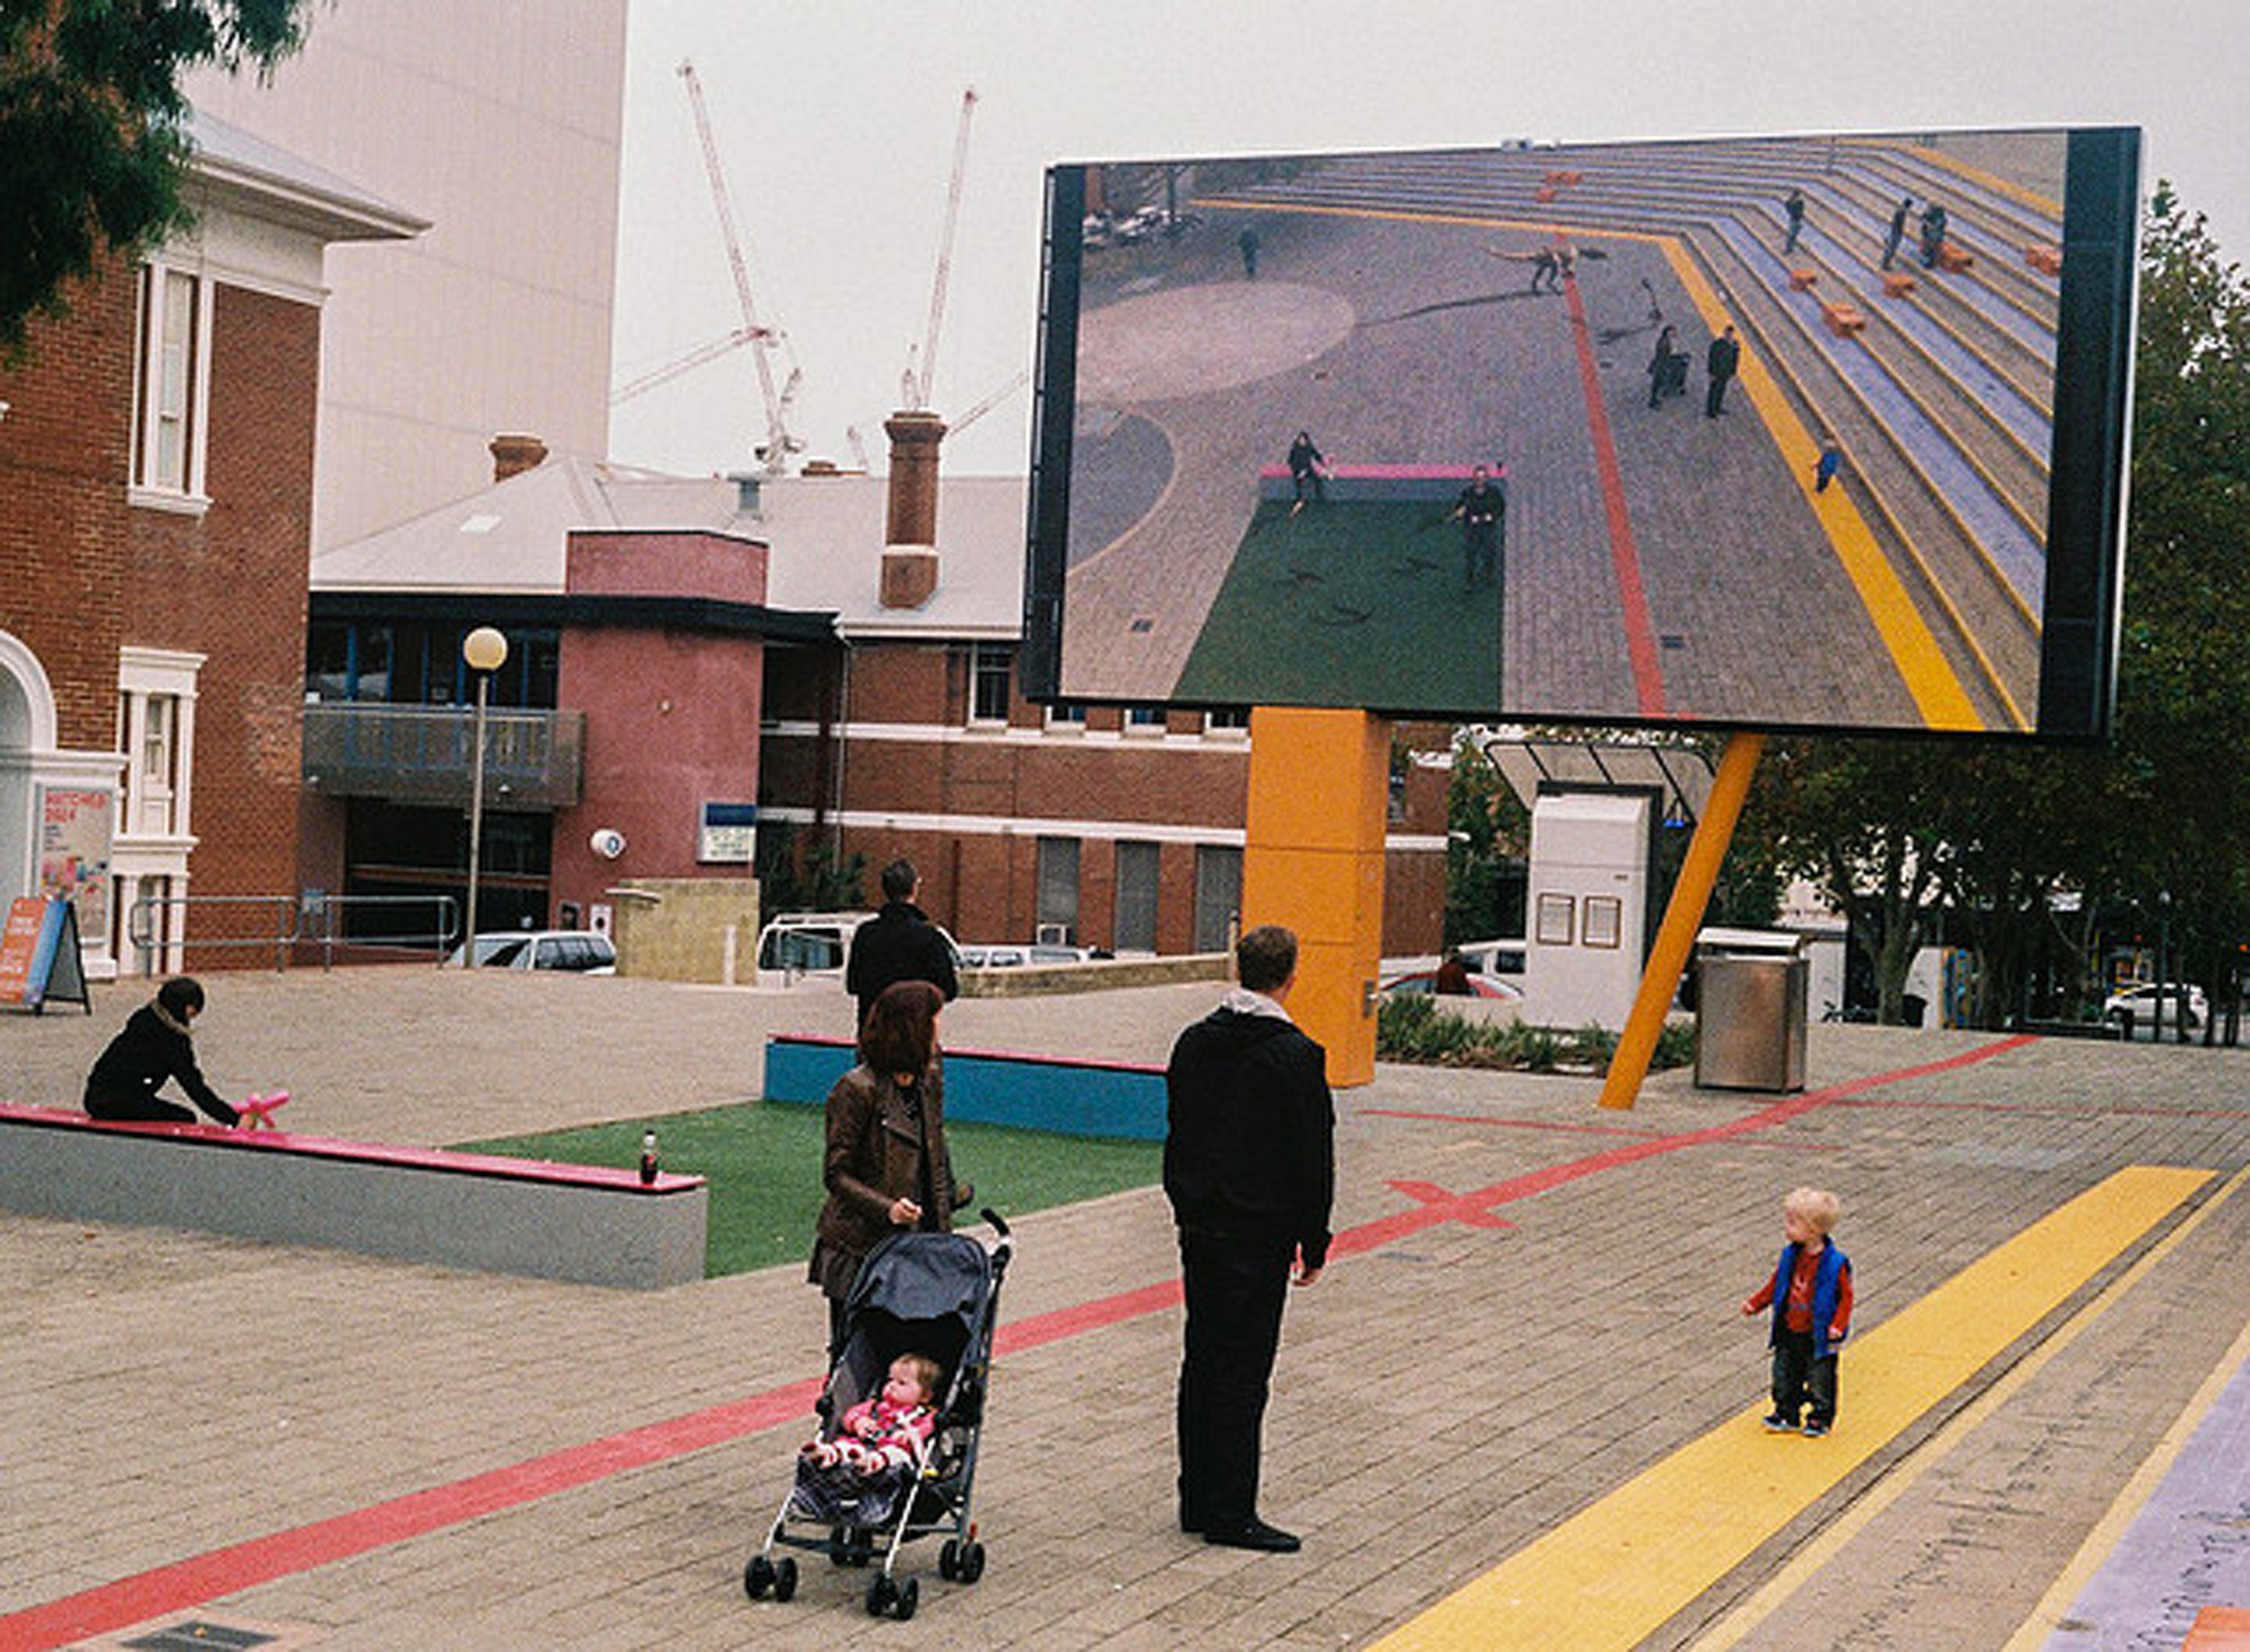 justin_tan_torres_australian_street_photography_screen_cultural_centre_dinosaurs_cctv_perth_northbridge_2014_05..jpg